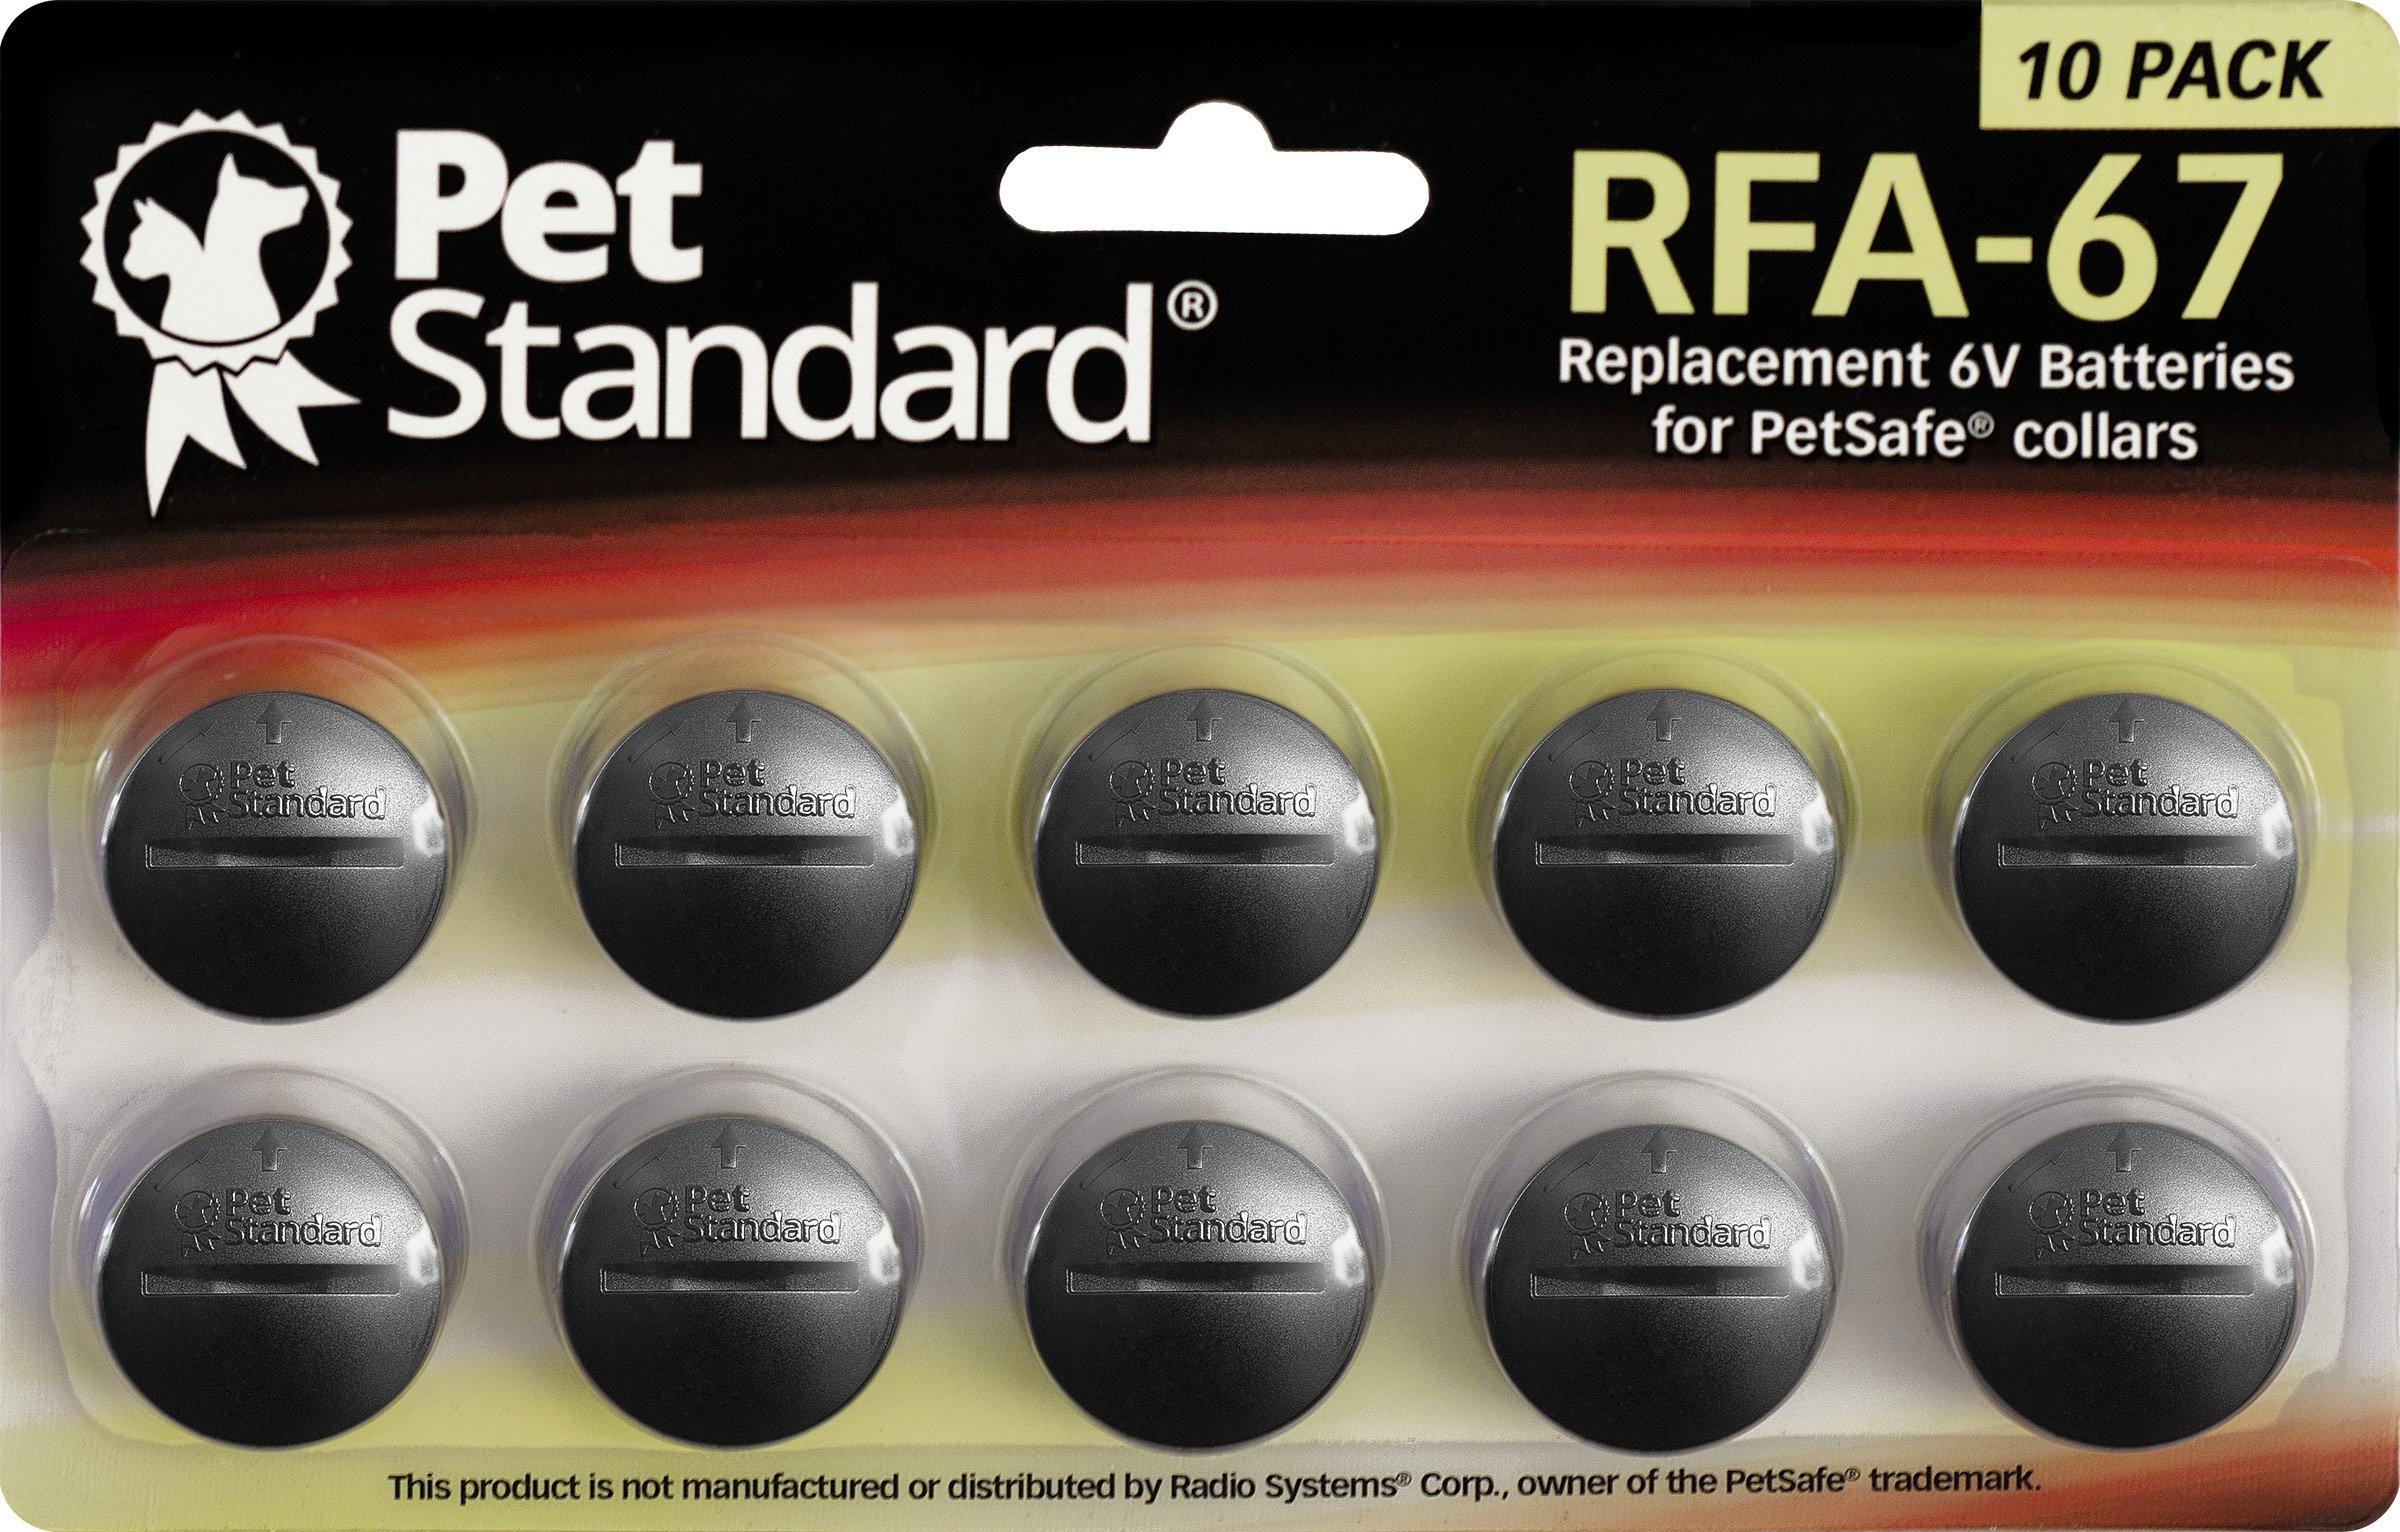 PetStandard Replacement Batteries for PetSafe RFA-67 (Pack of 10) by PET STANDARD